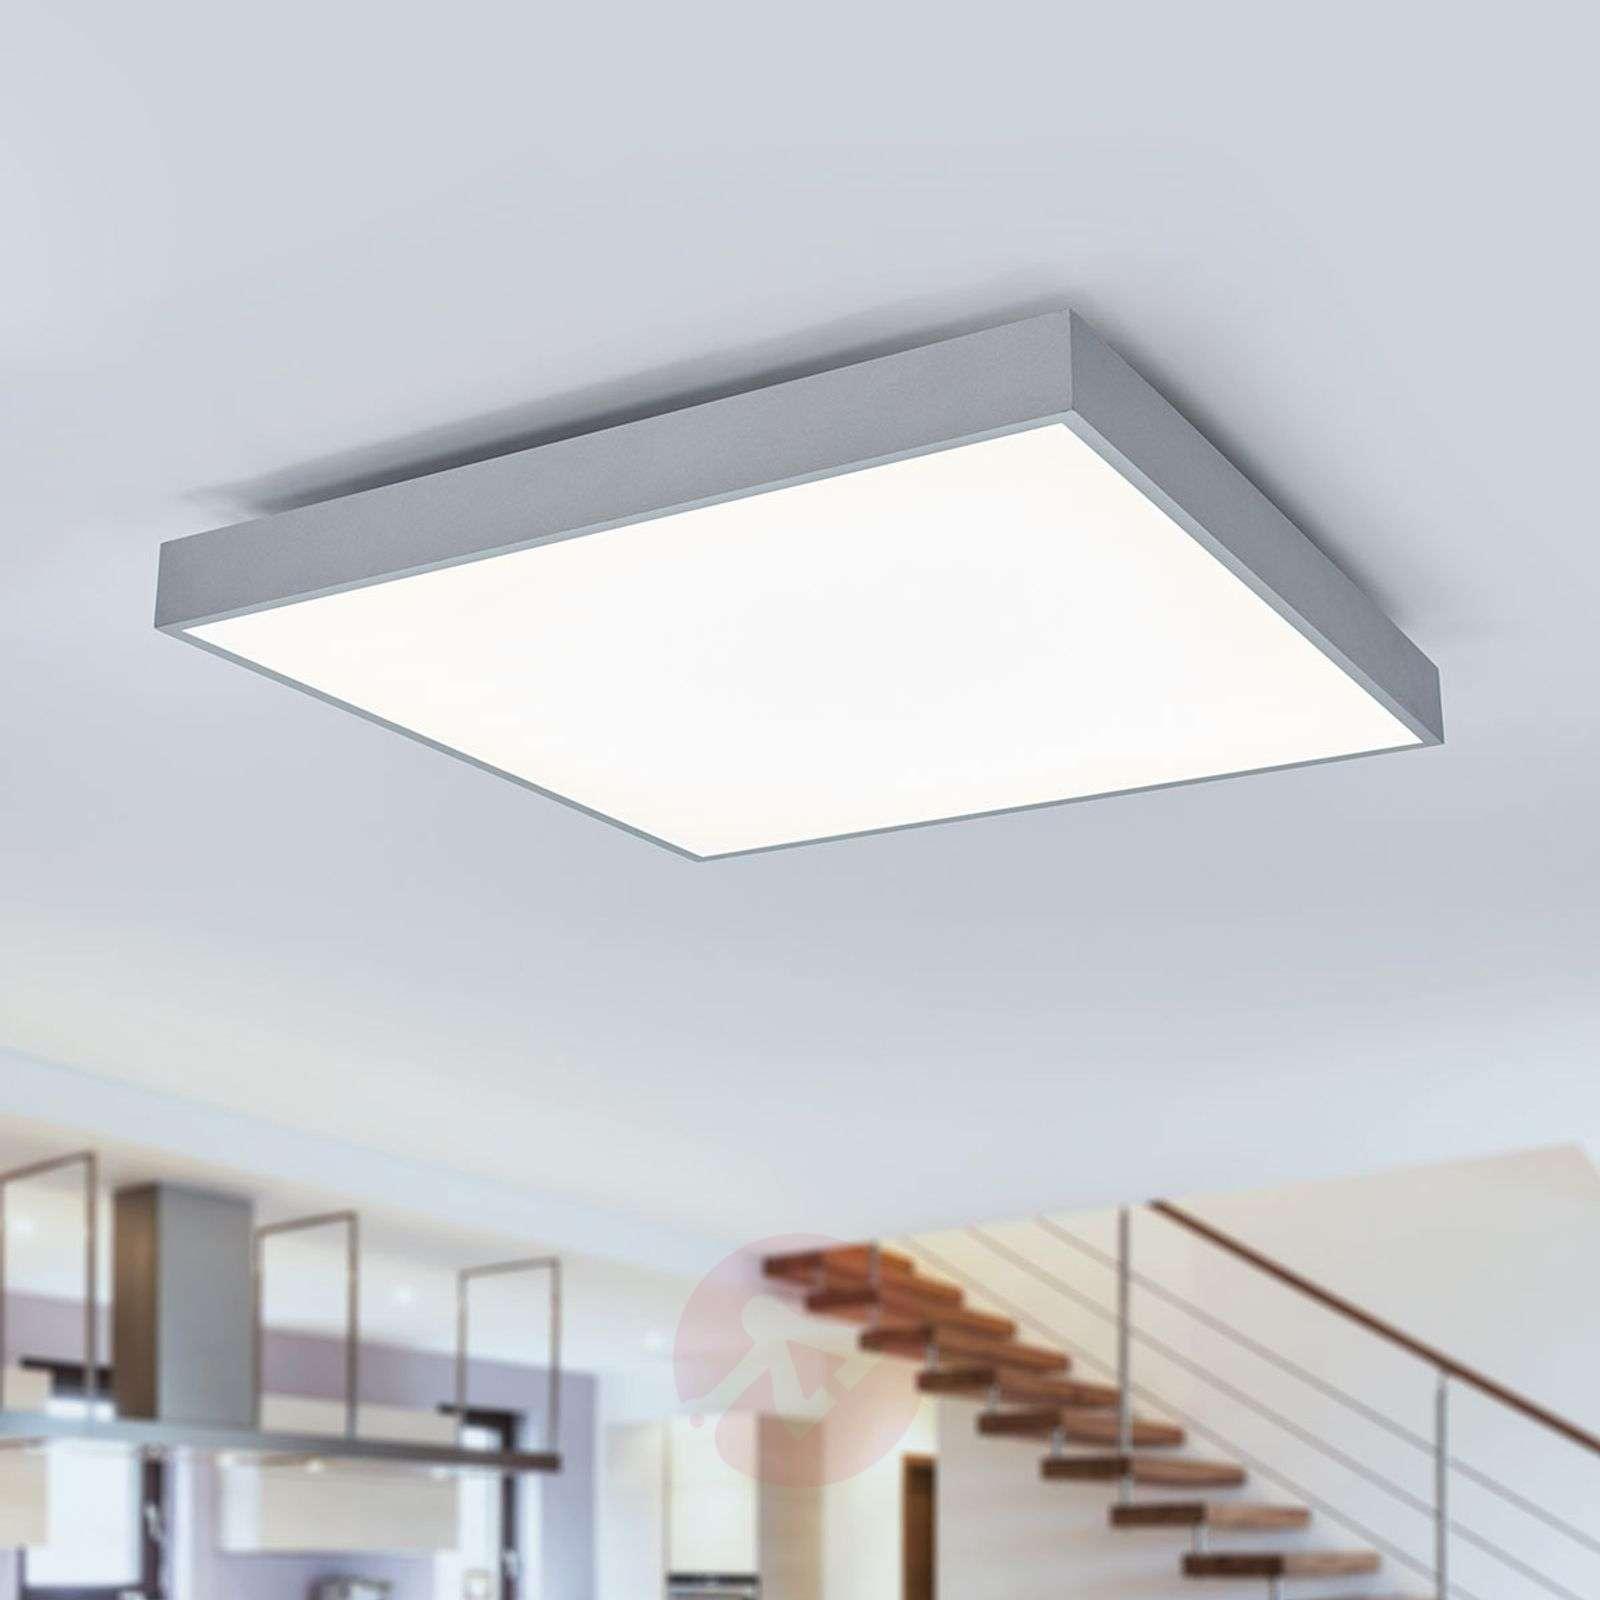 LED-paneeli Vince kaukosäätimellä, 60 x 60 cm-9956029-02